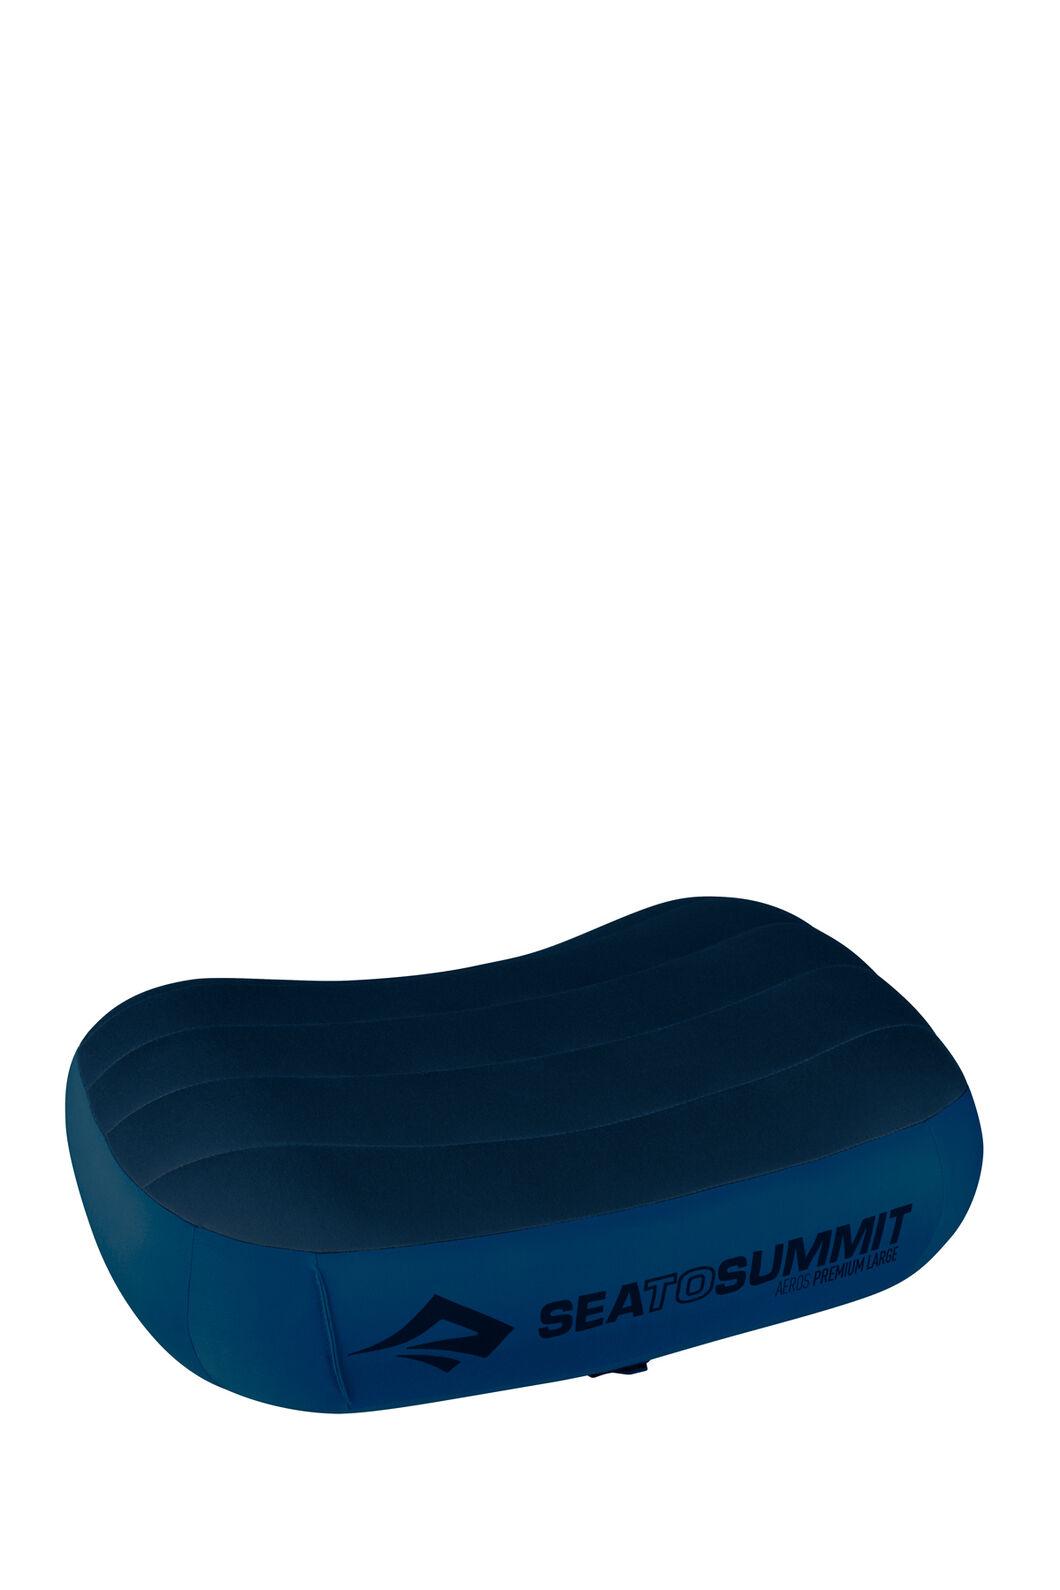 Sea to Summit Aeros Premium Pillow — Large, Navy, hi-res